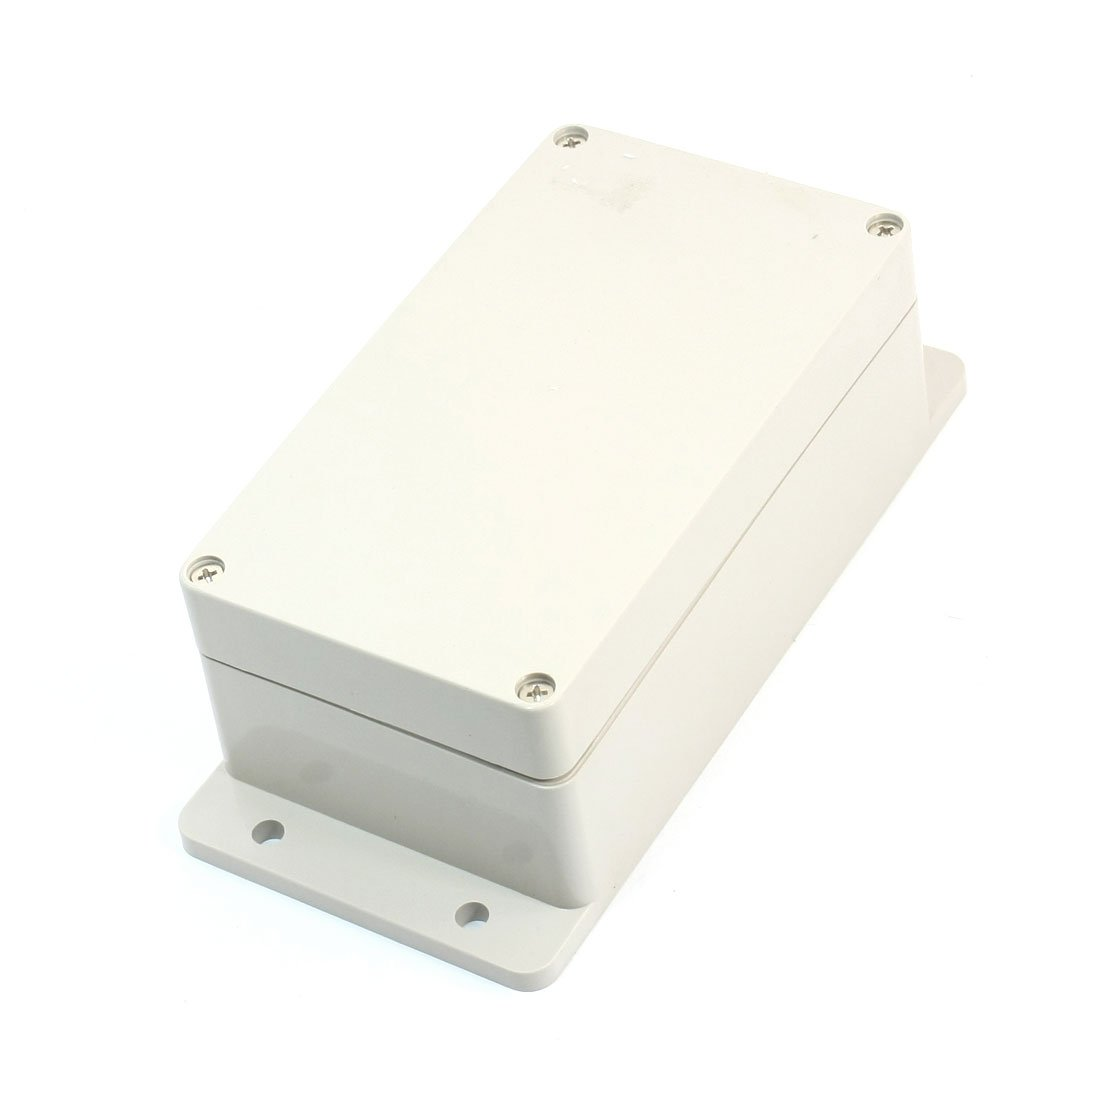 Sellado Caja De Plá stico Interruptor Elé ctrico Caja De Derivació n Case 158x90x60mm Sourcingmap a14061200ux0354